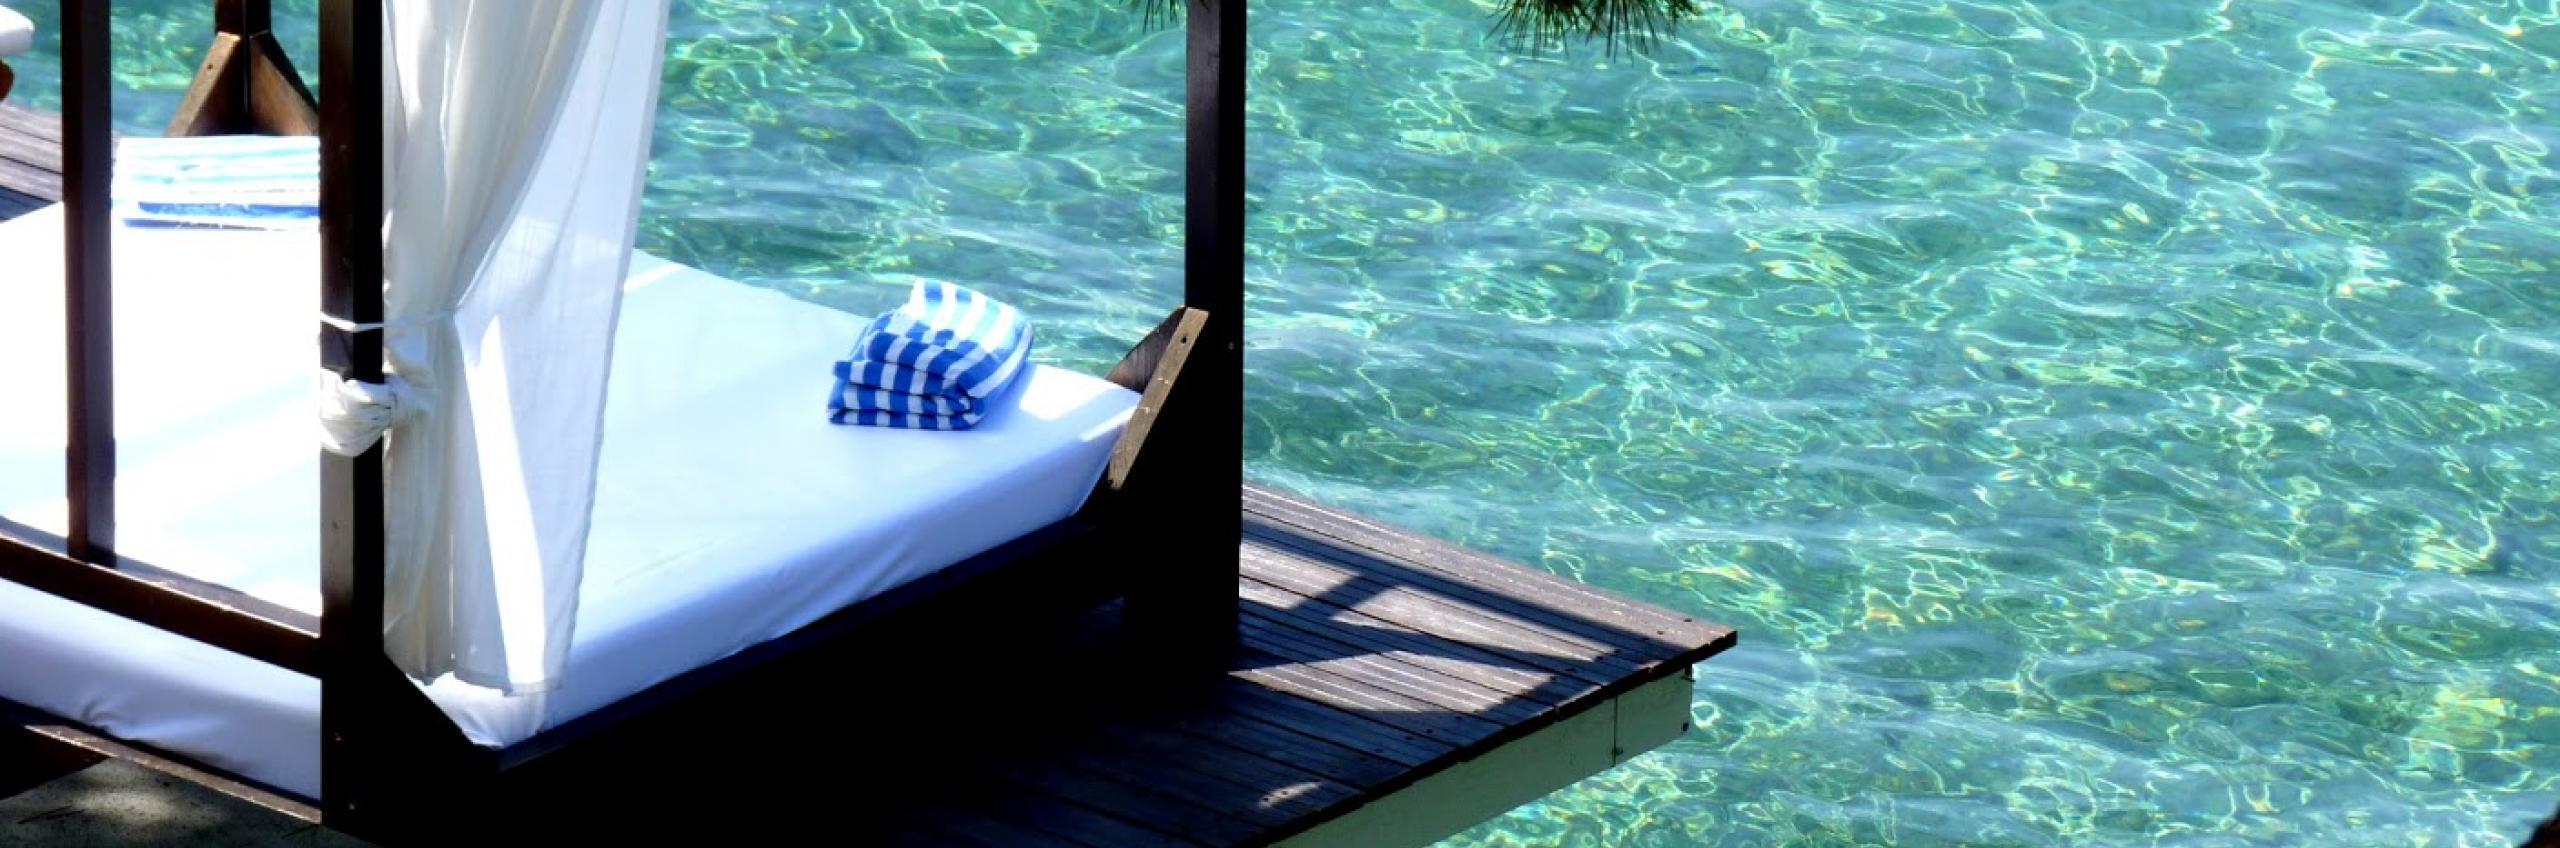 Bonj 'les bains' Beach rentals